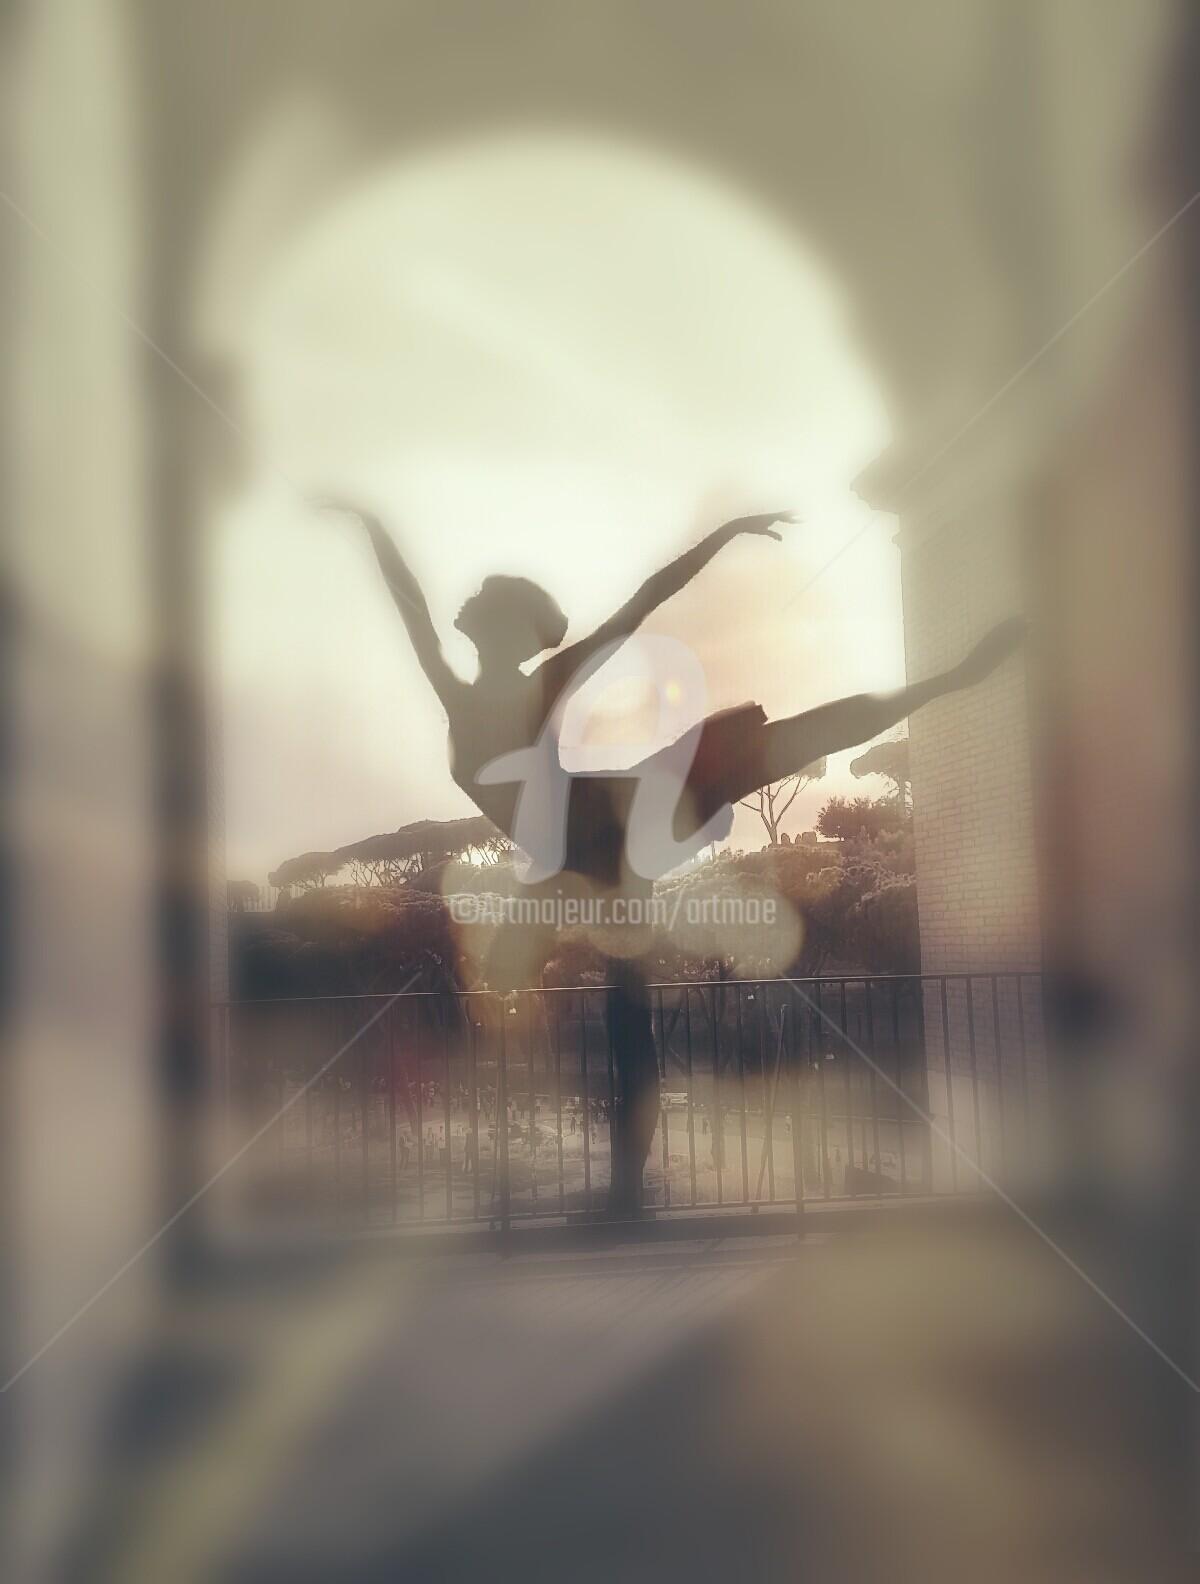 Art Moé - City Walk #4 Rom Colosseo